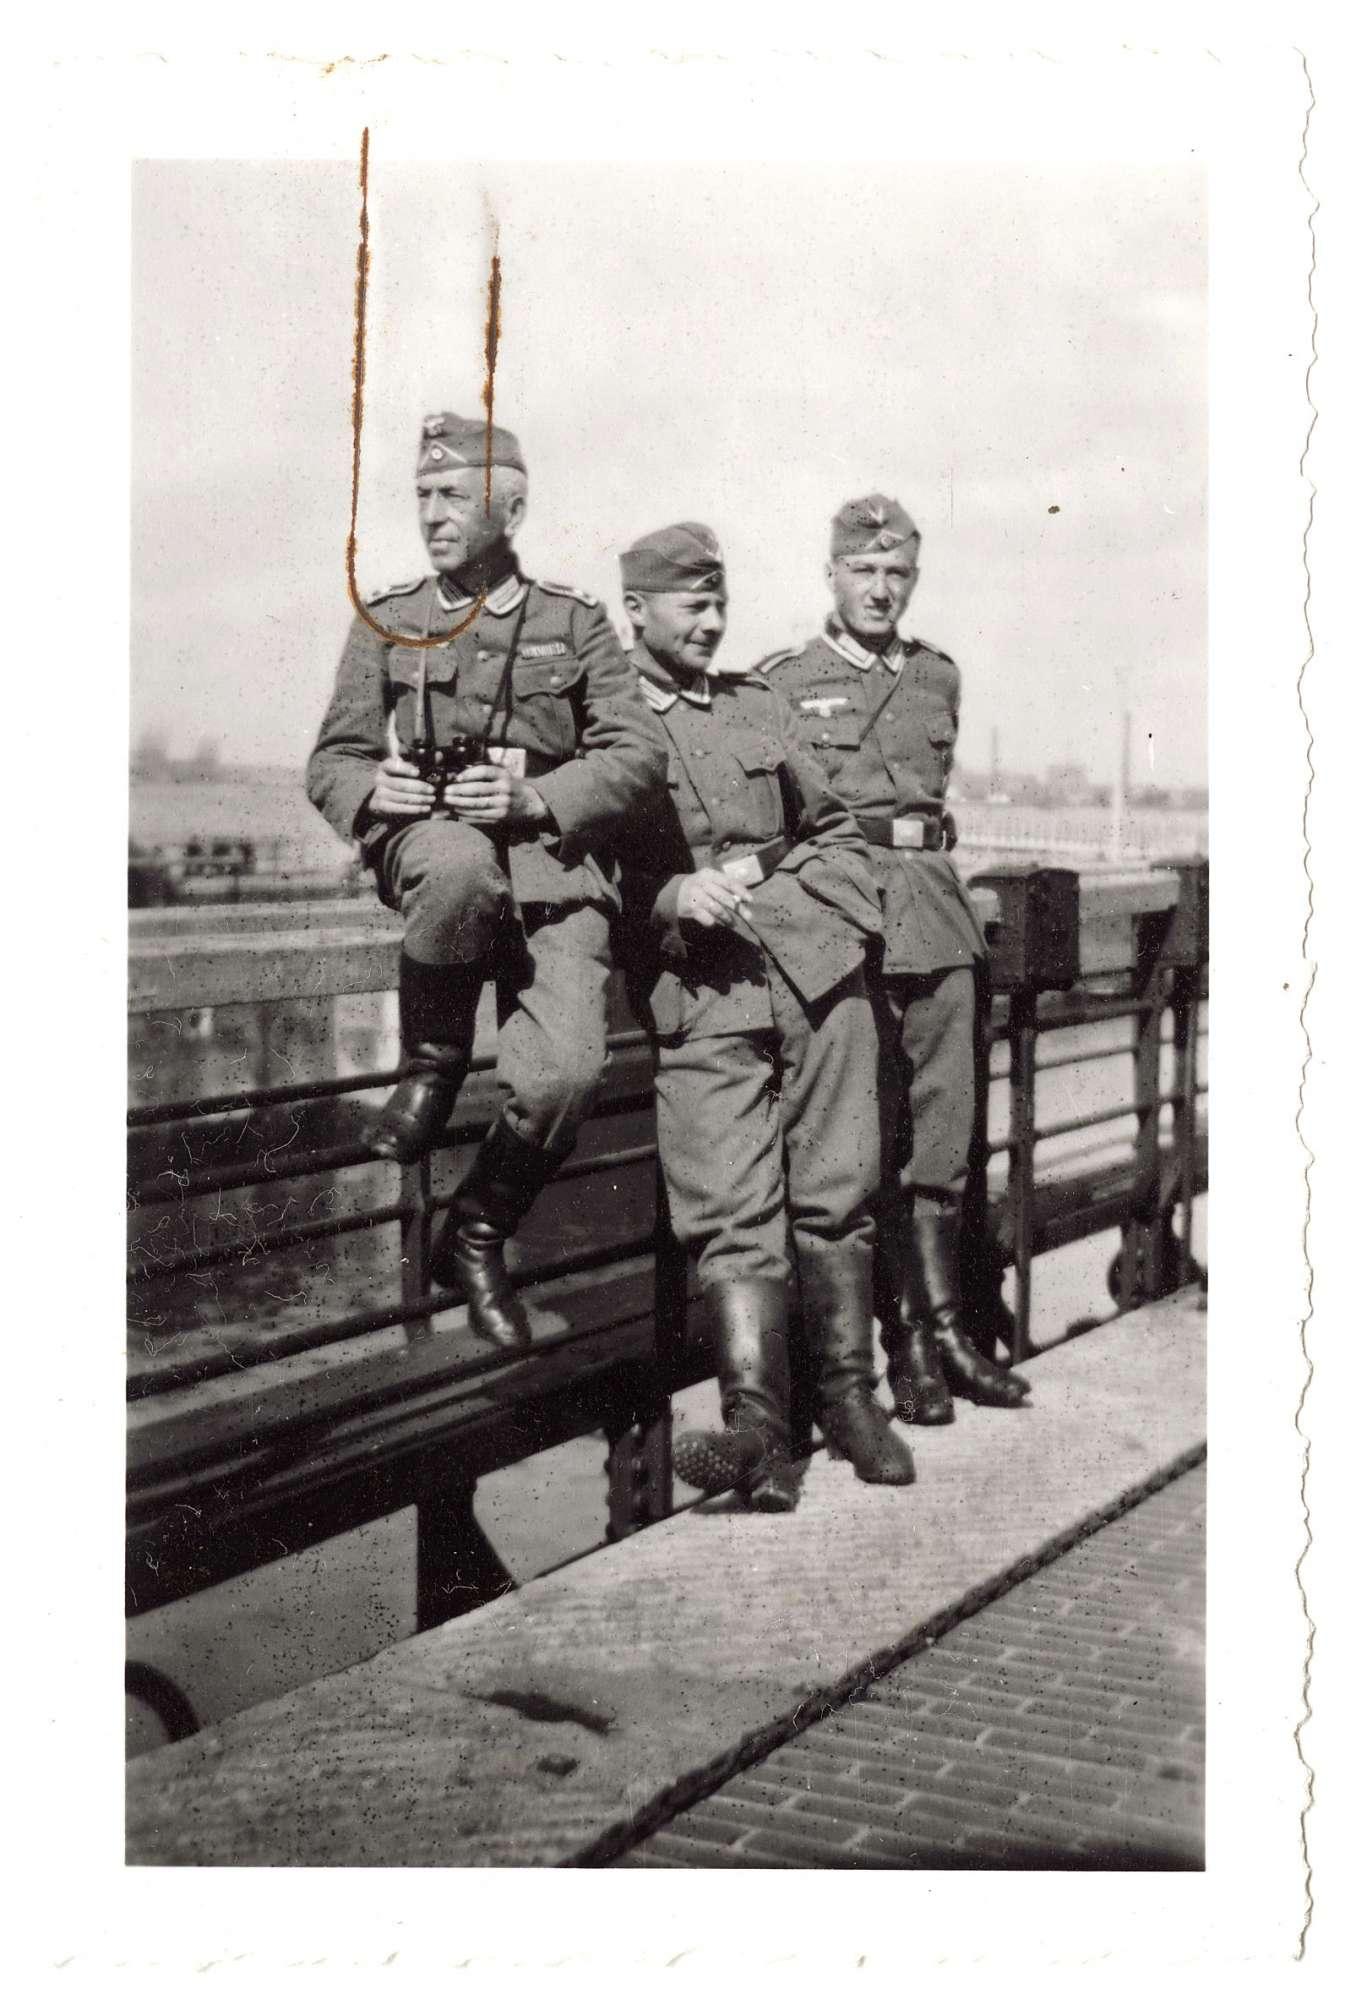 Falch, Eugen, Bild 2